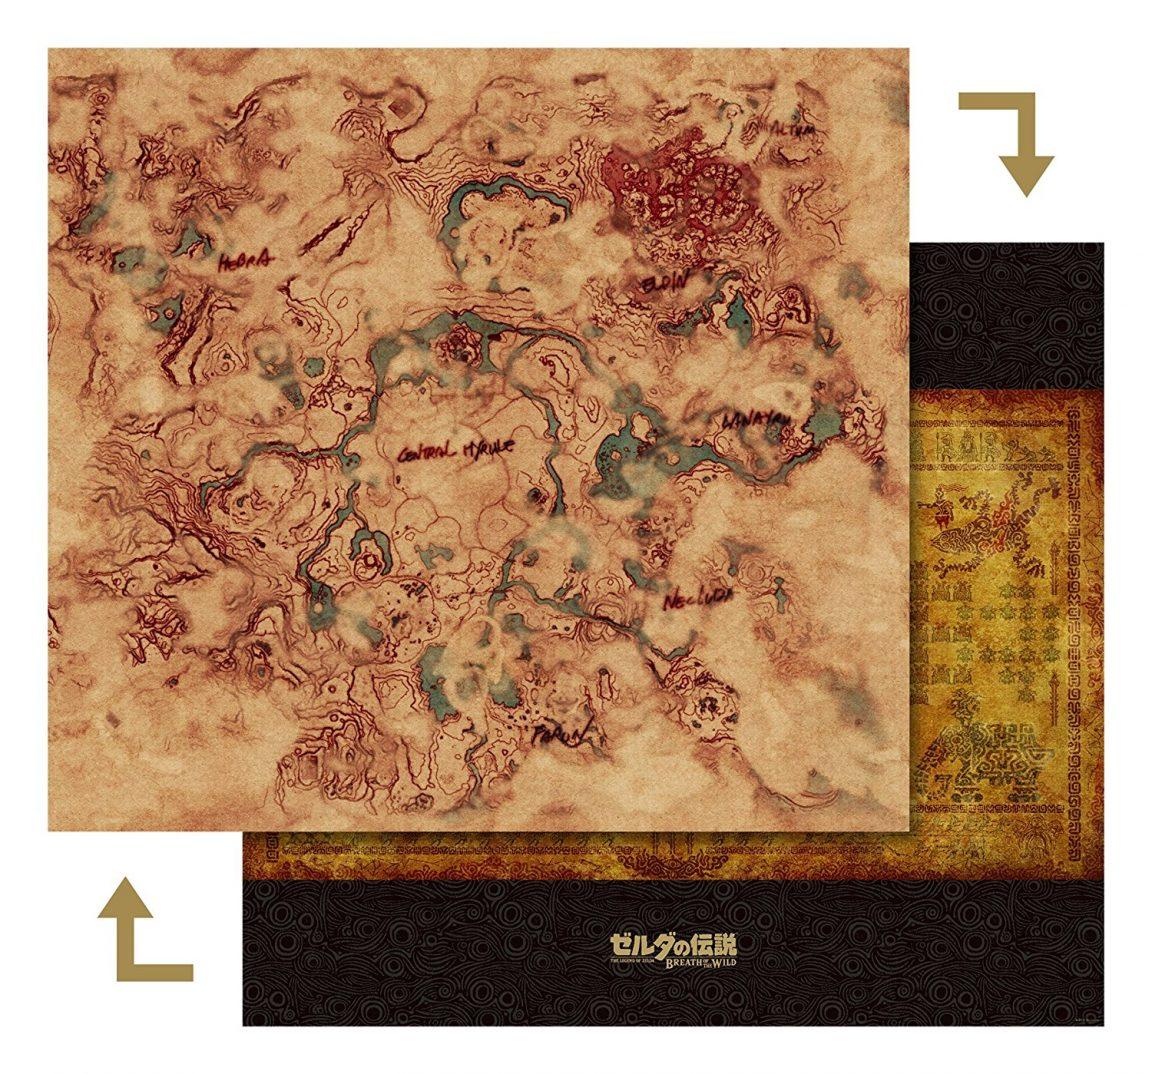 the_legend_of_zelda_breath_of_the_wild_map